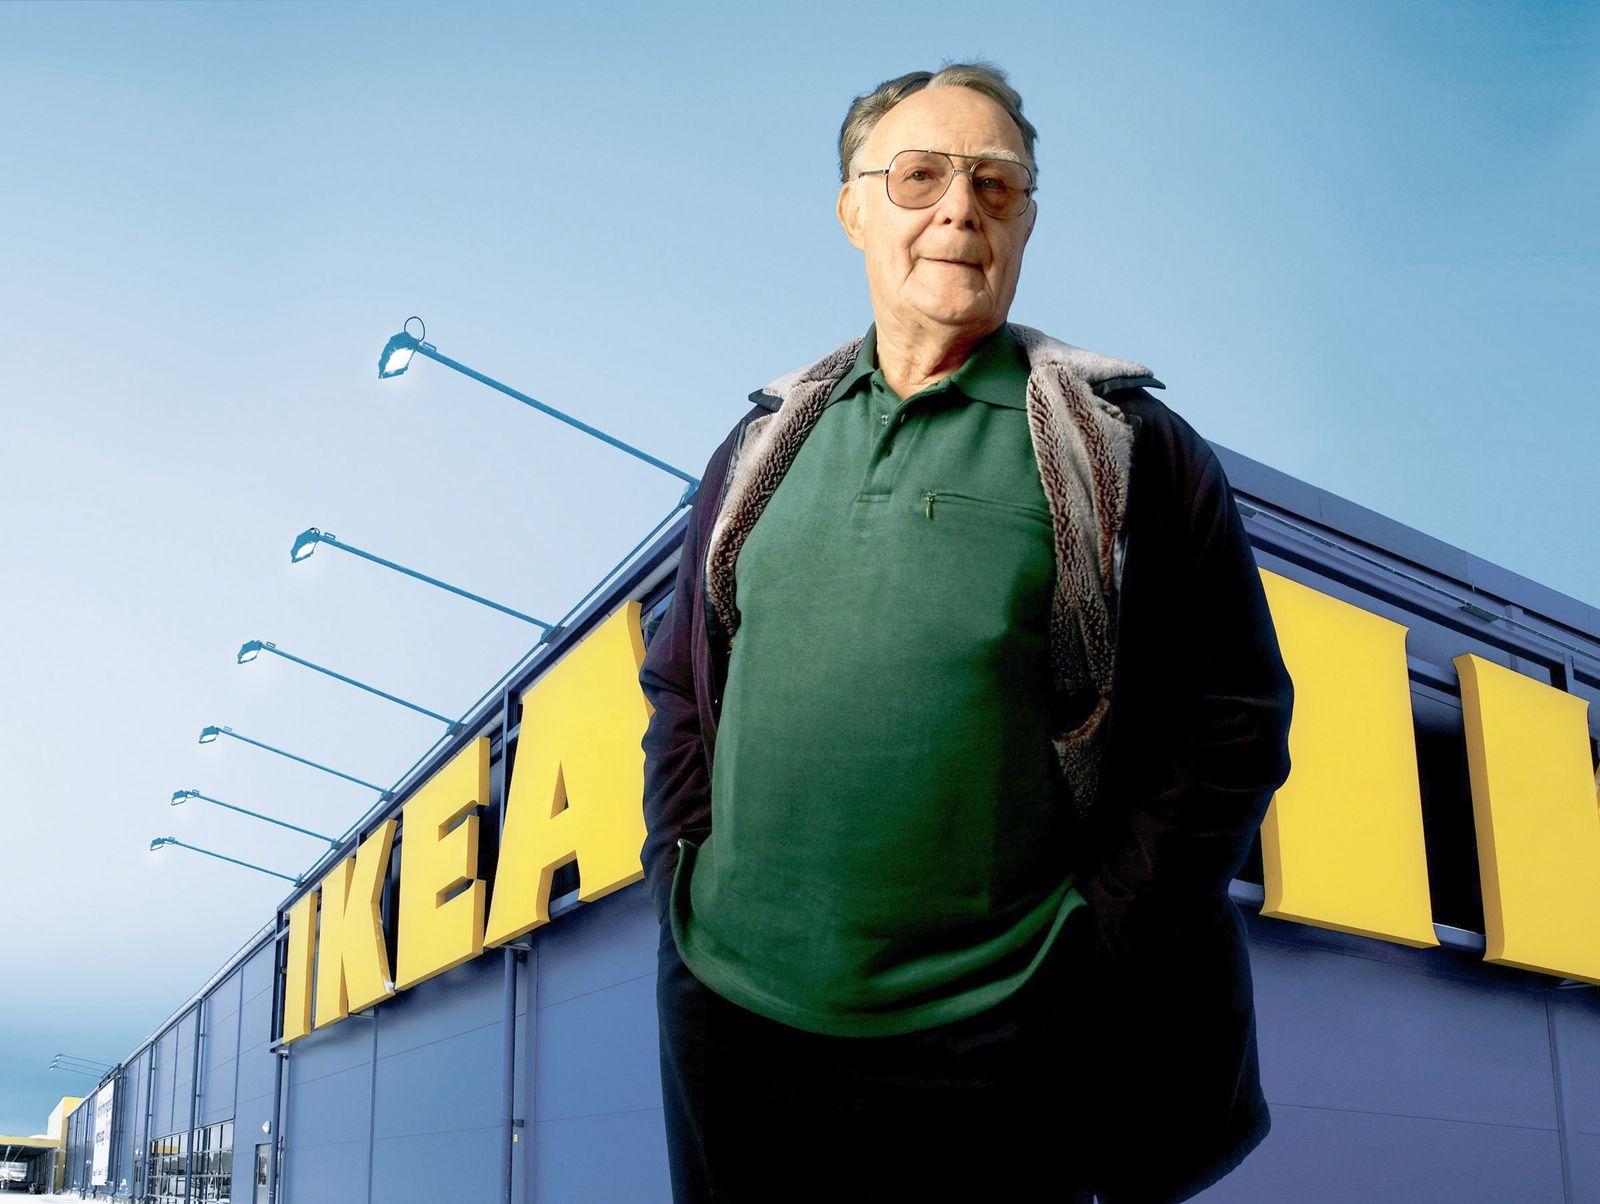 Ikea-Gründer Kamprad